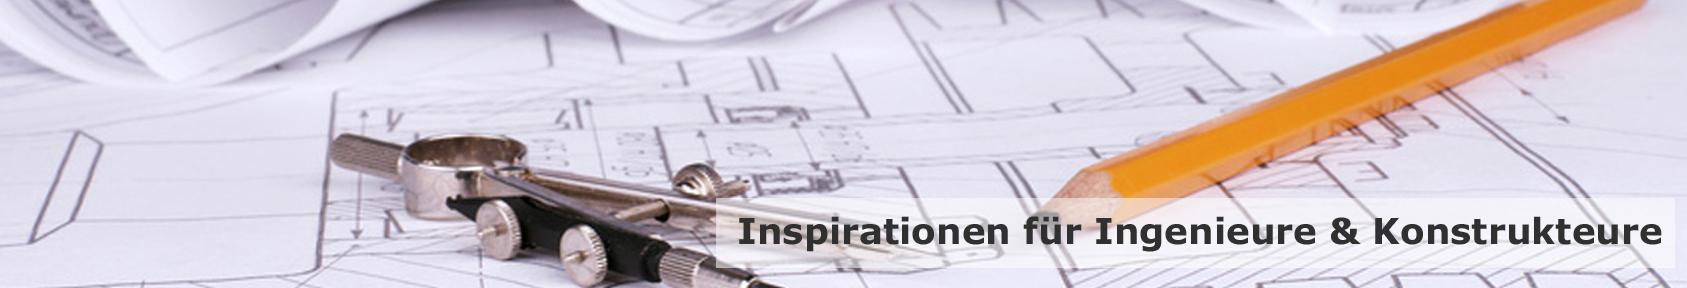 Inspirationen für Ingenieure & Konstrukteure